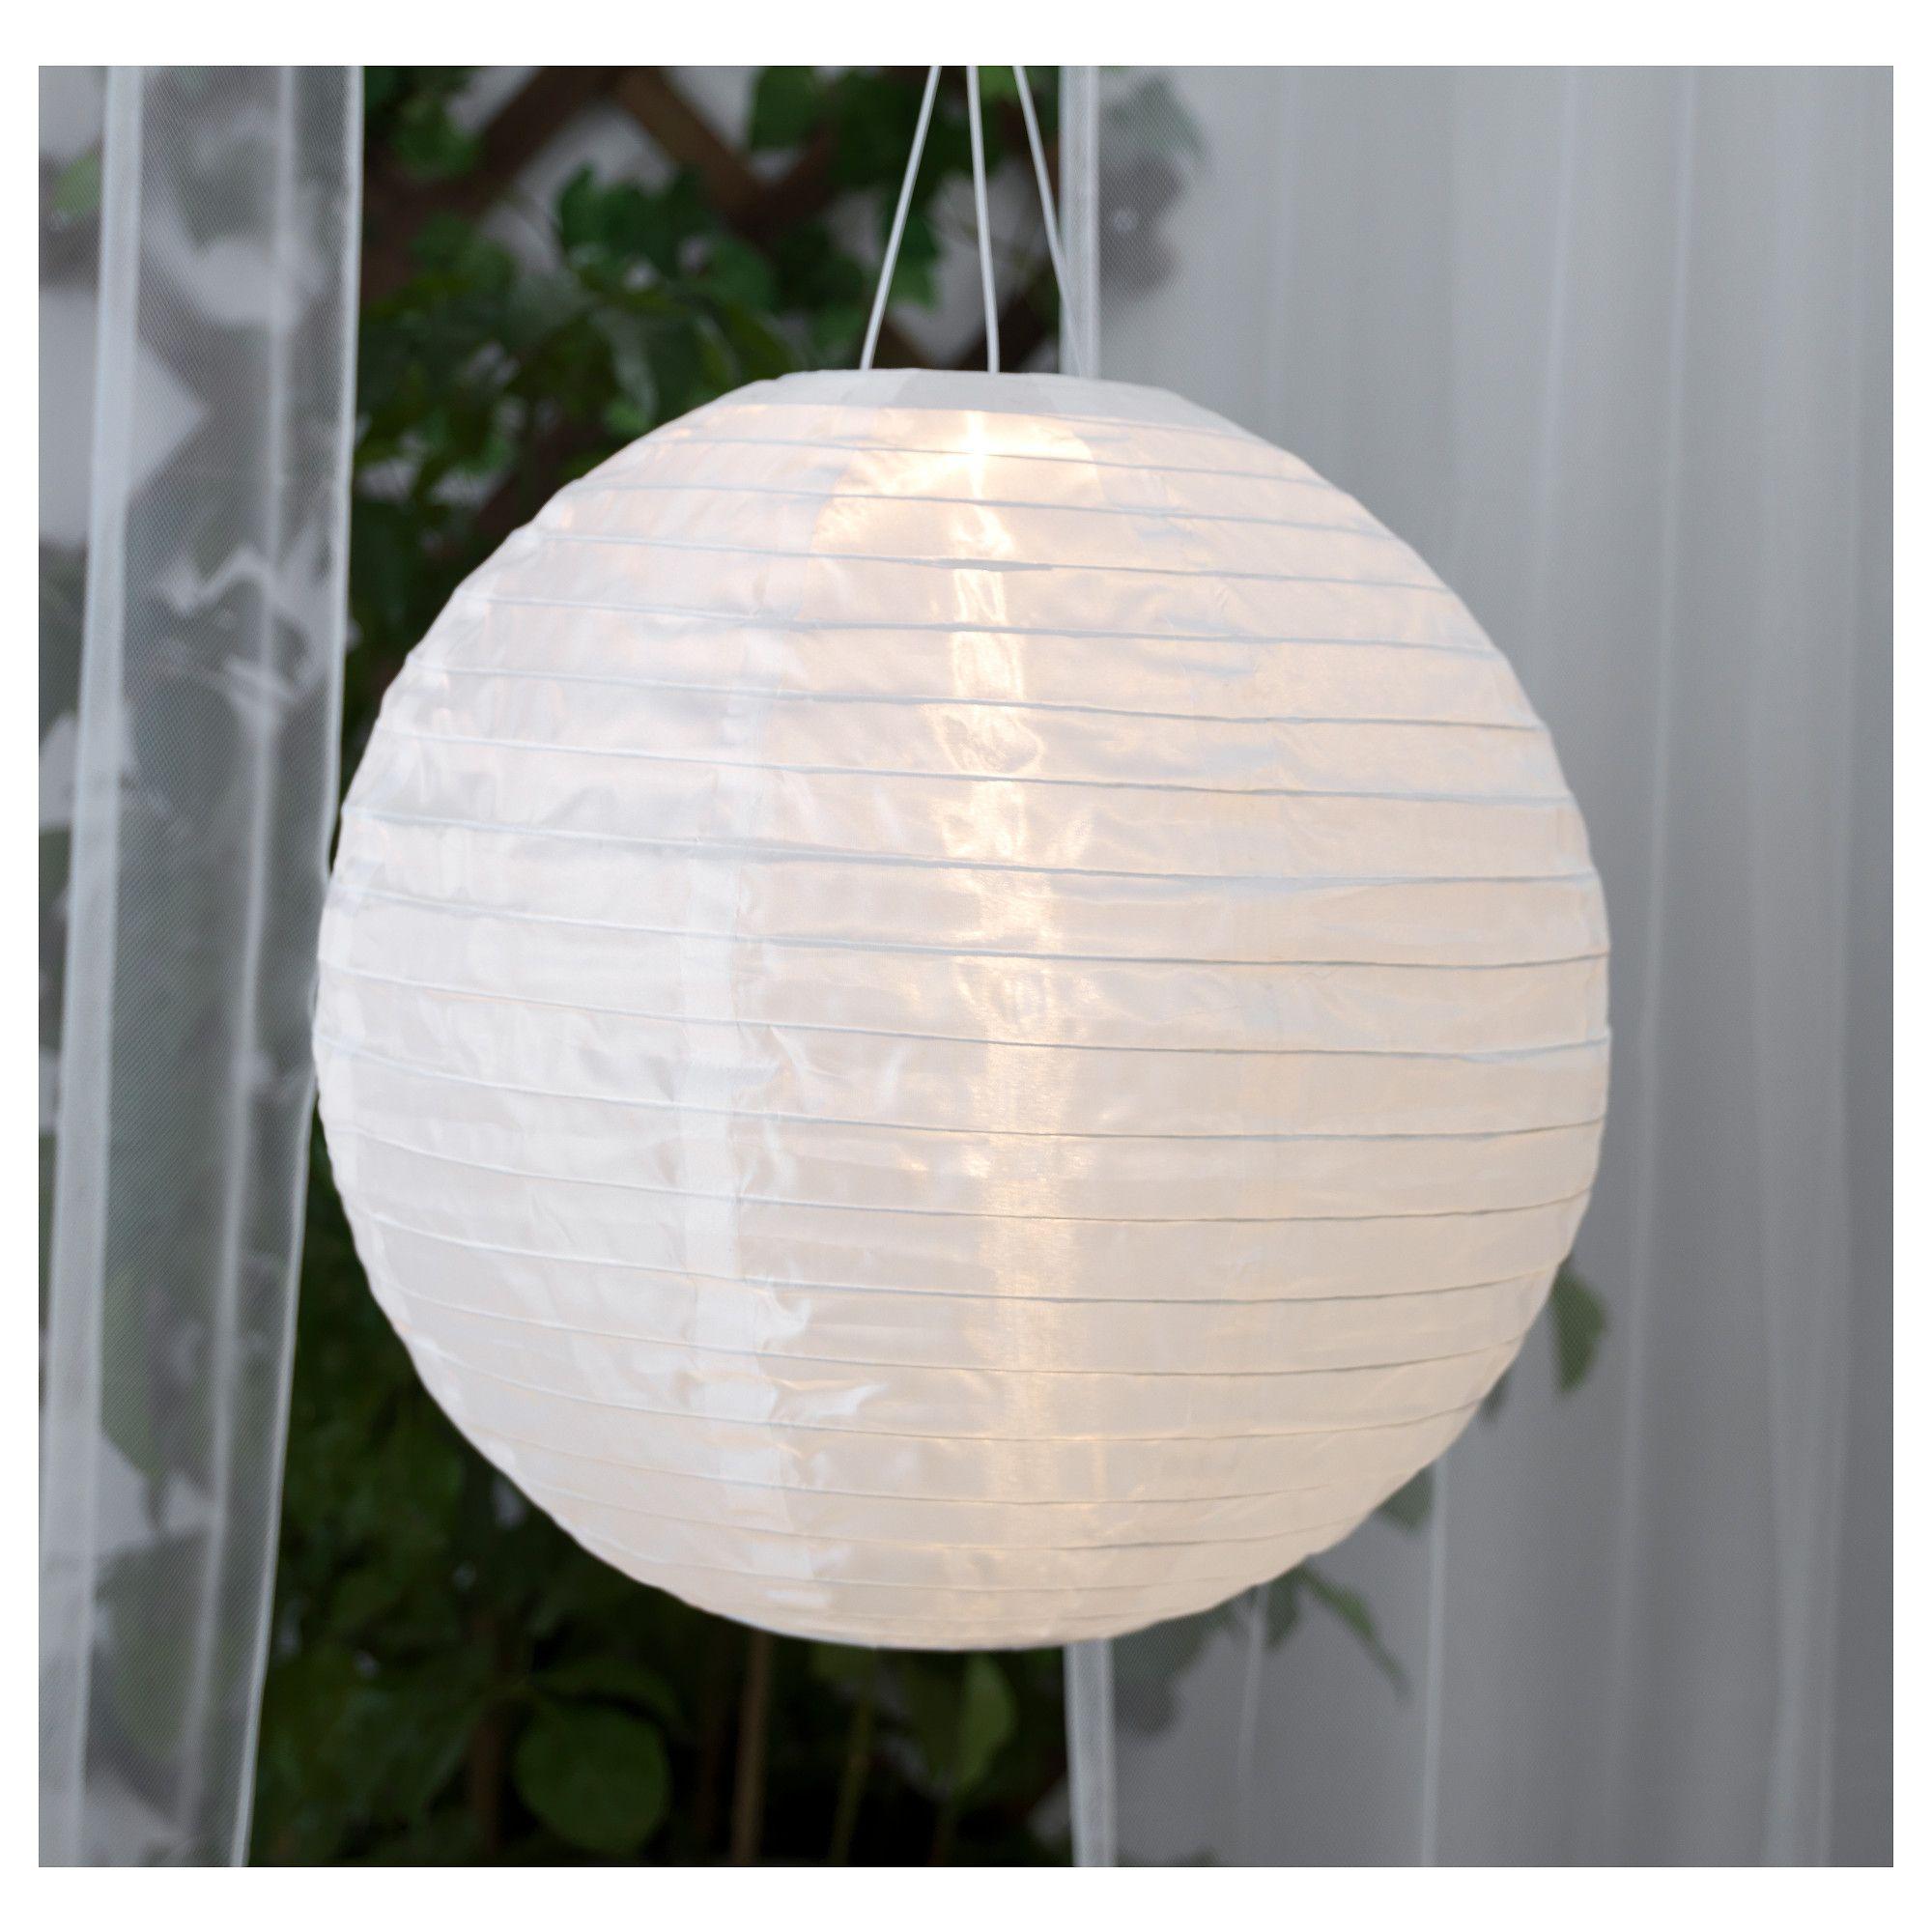 a8c6c92205f53fcec3d2663d4a45776e Incroyable De Table Balcon Suspendue Ikea Concept